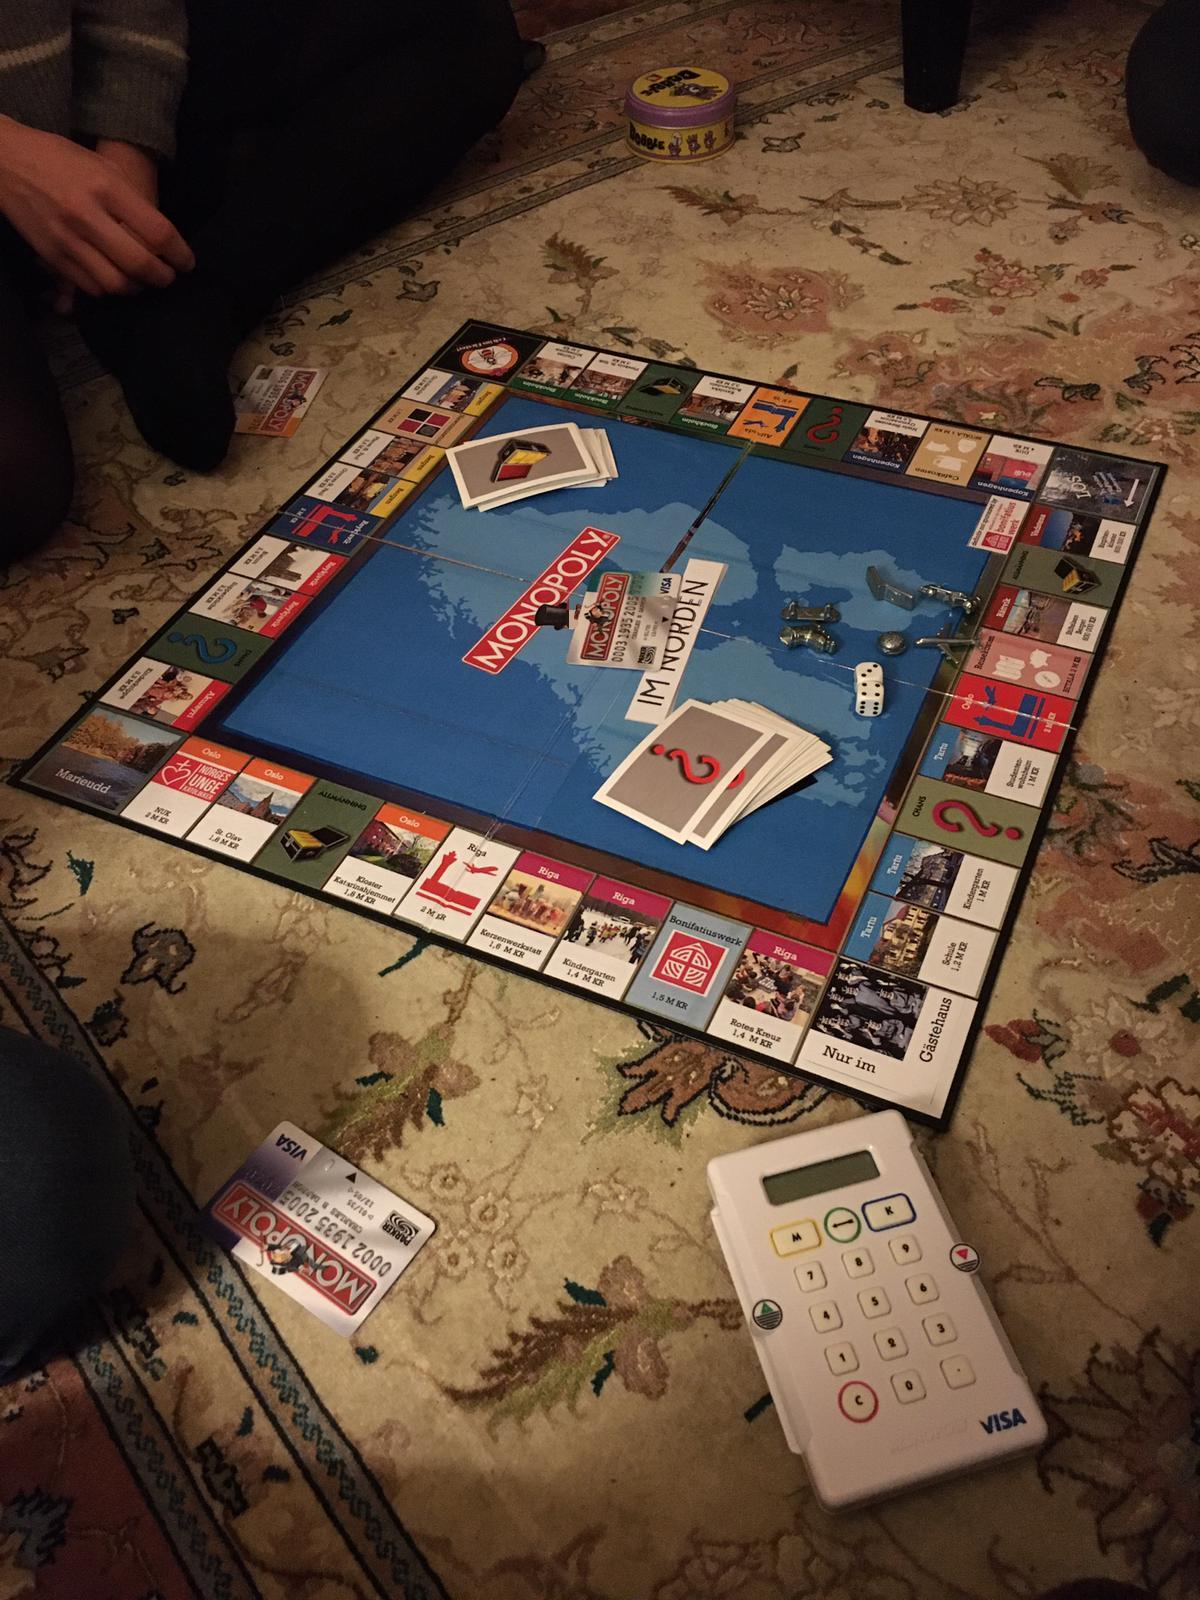 Praktikum im Norden Monopoly